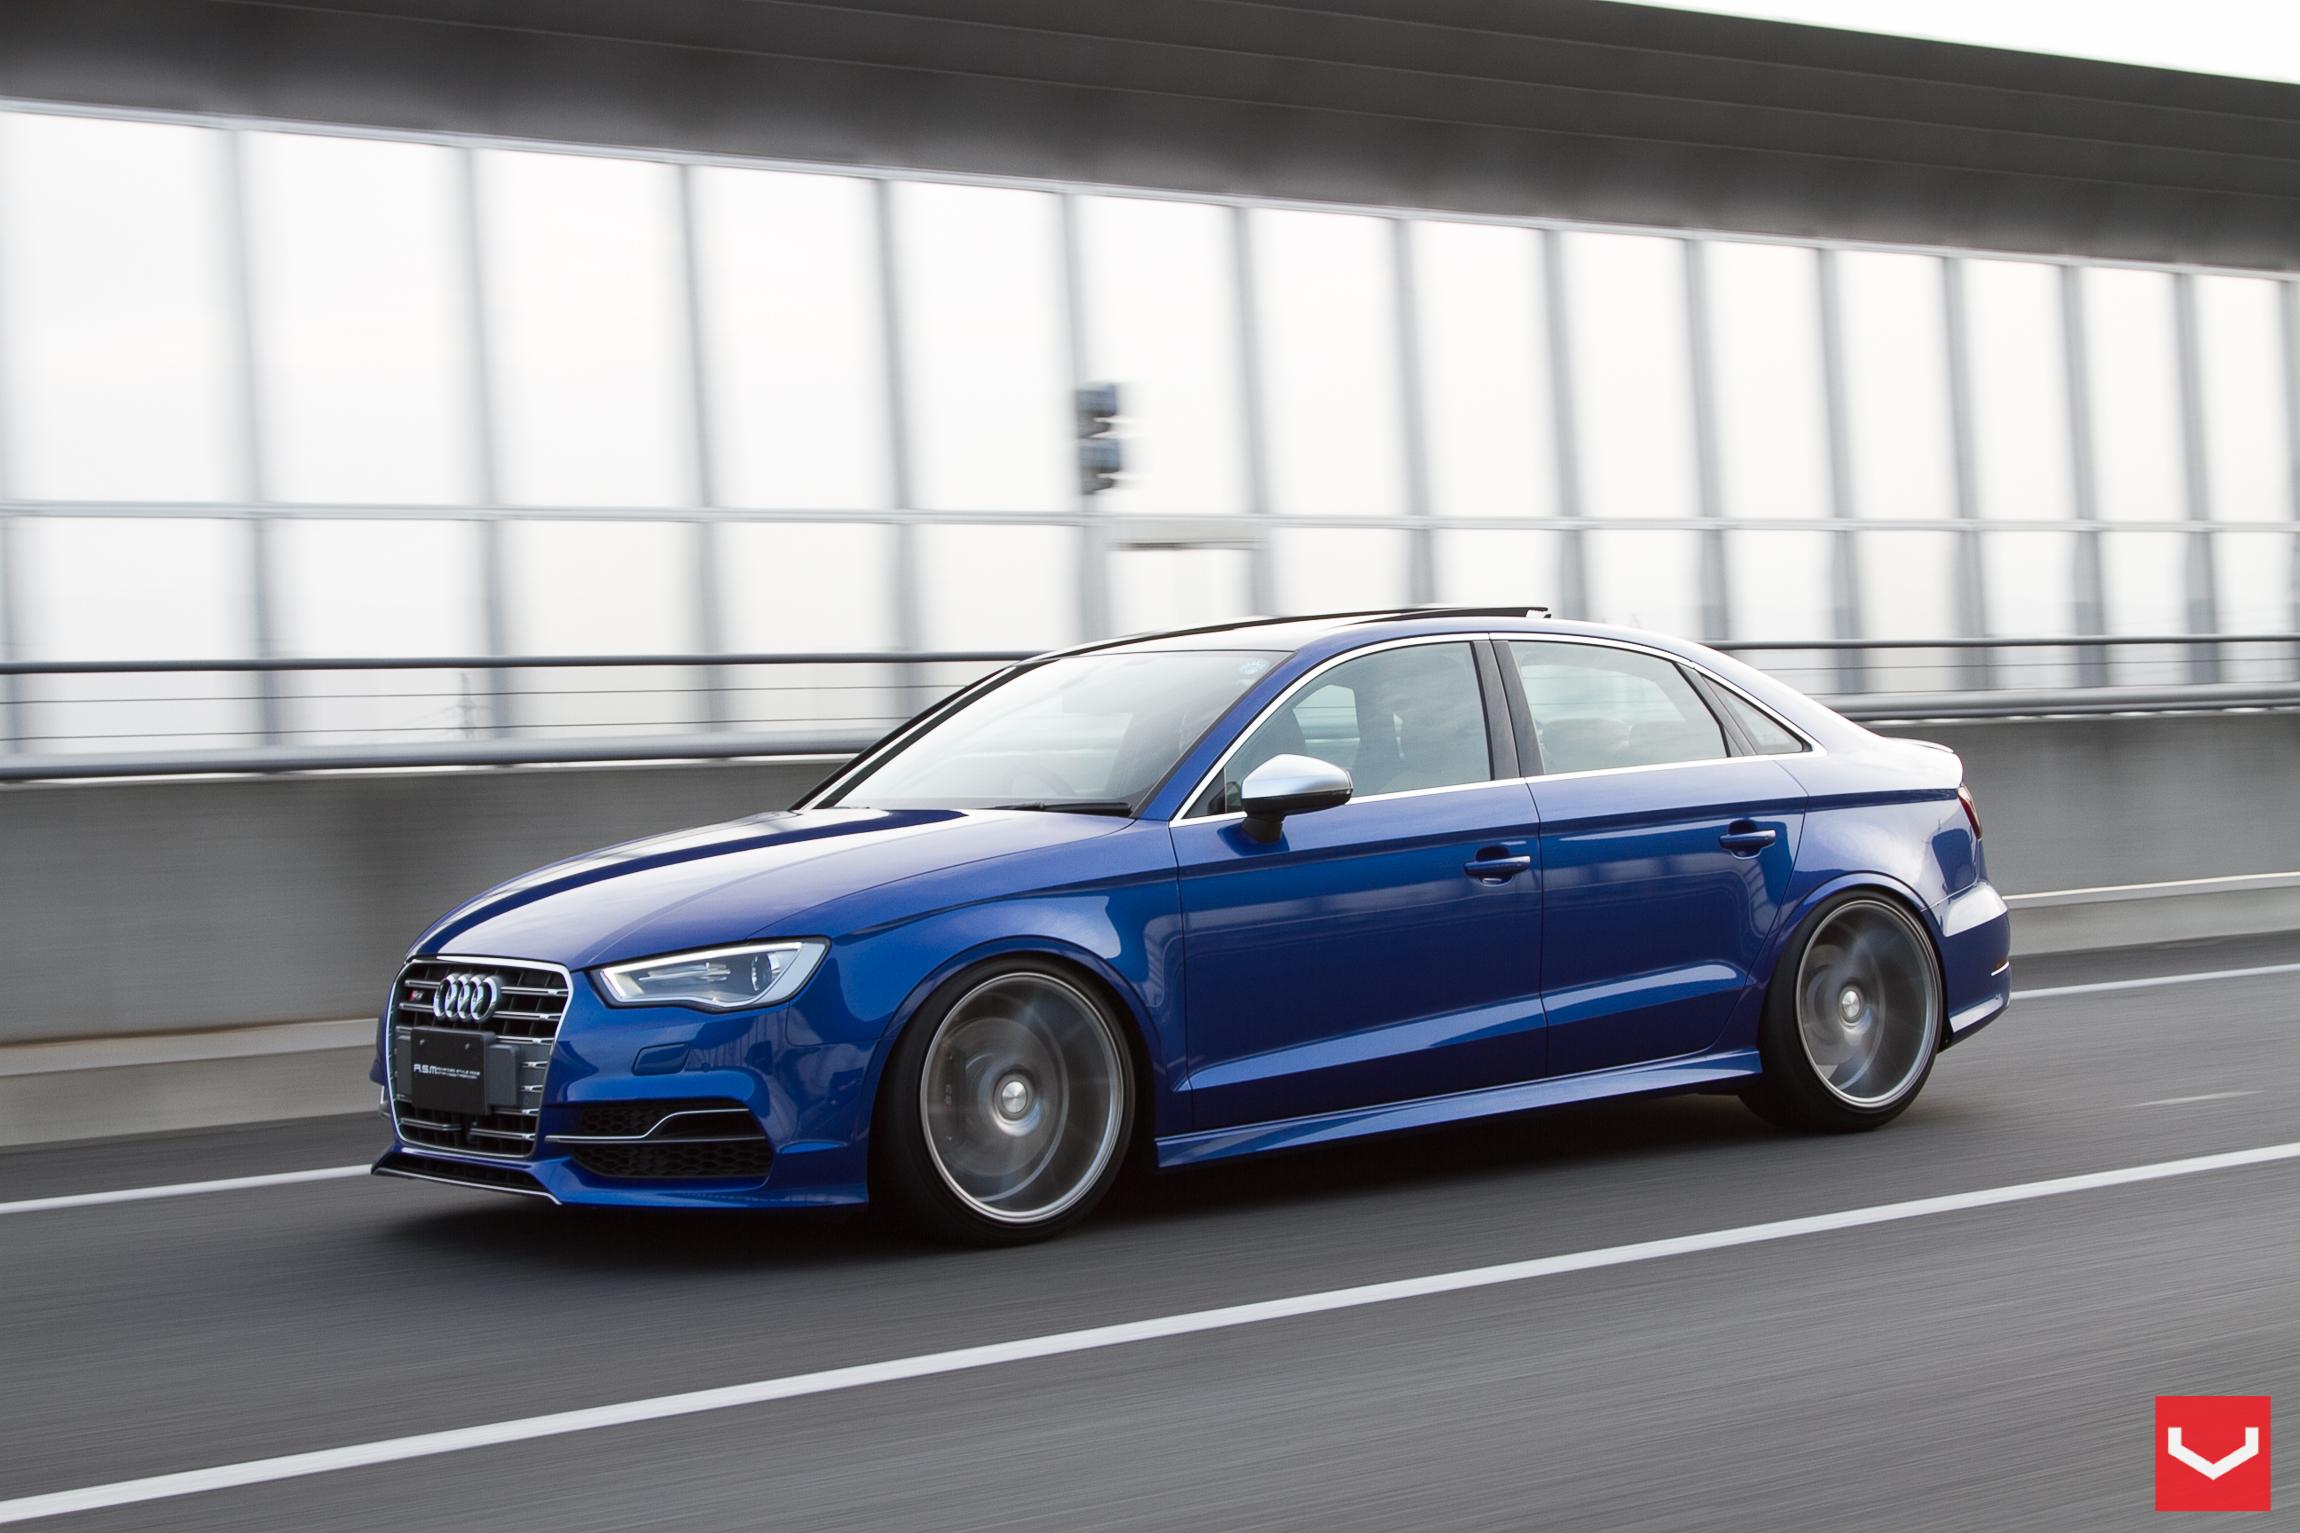 2015 audi s3 sedan stanced on vossen wheels